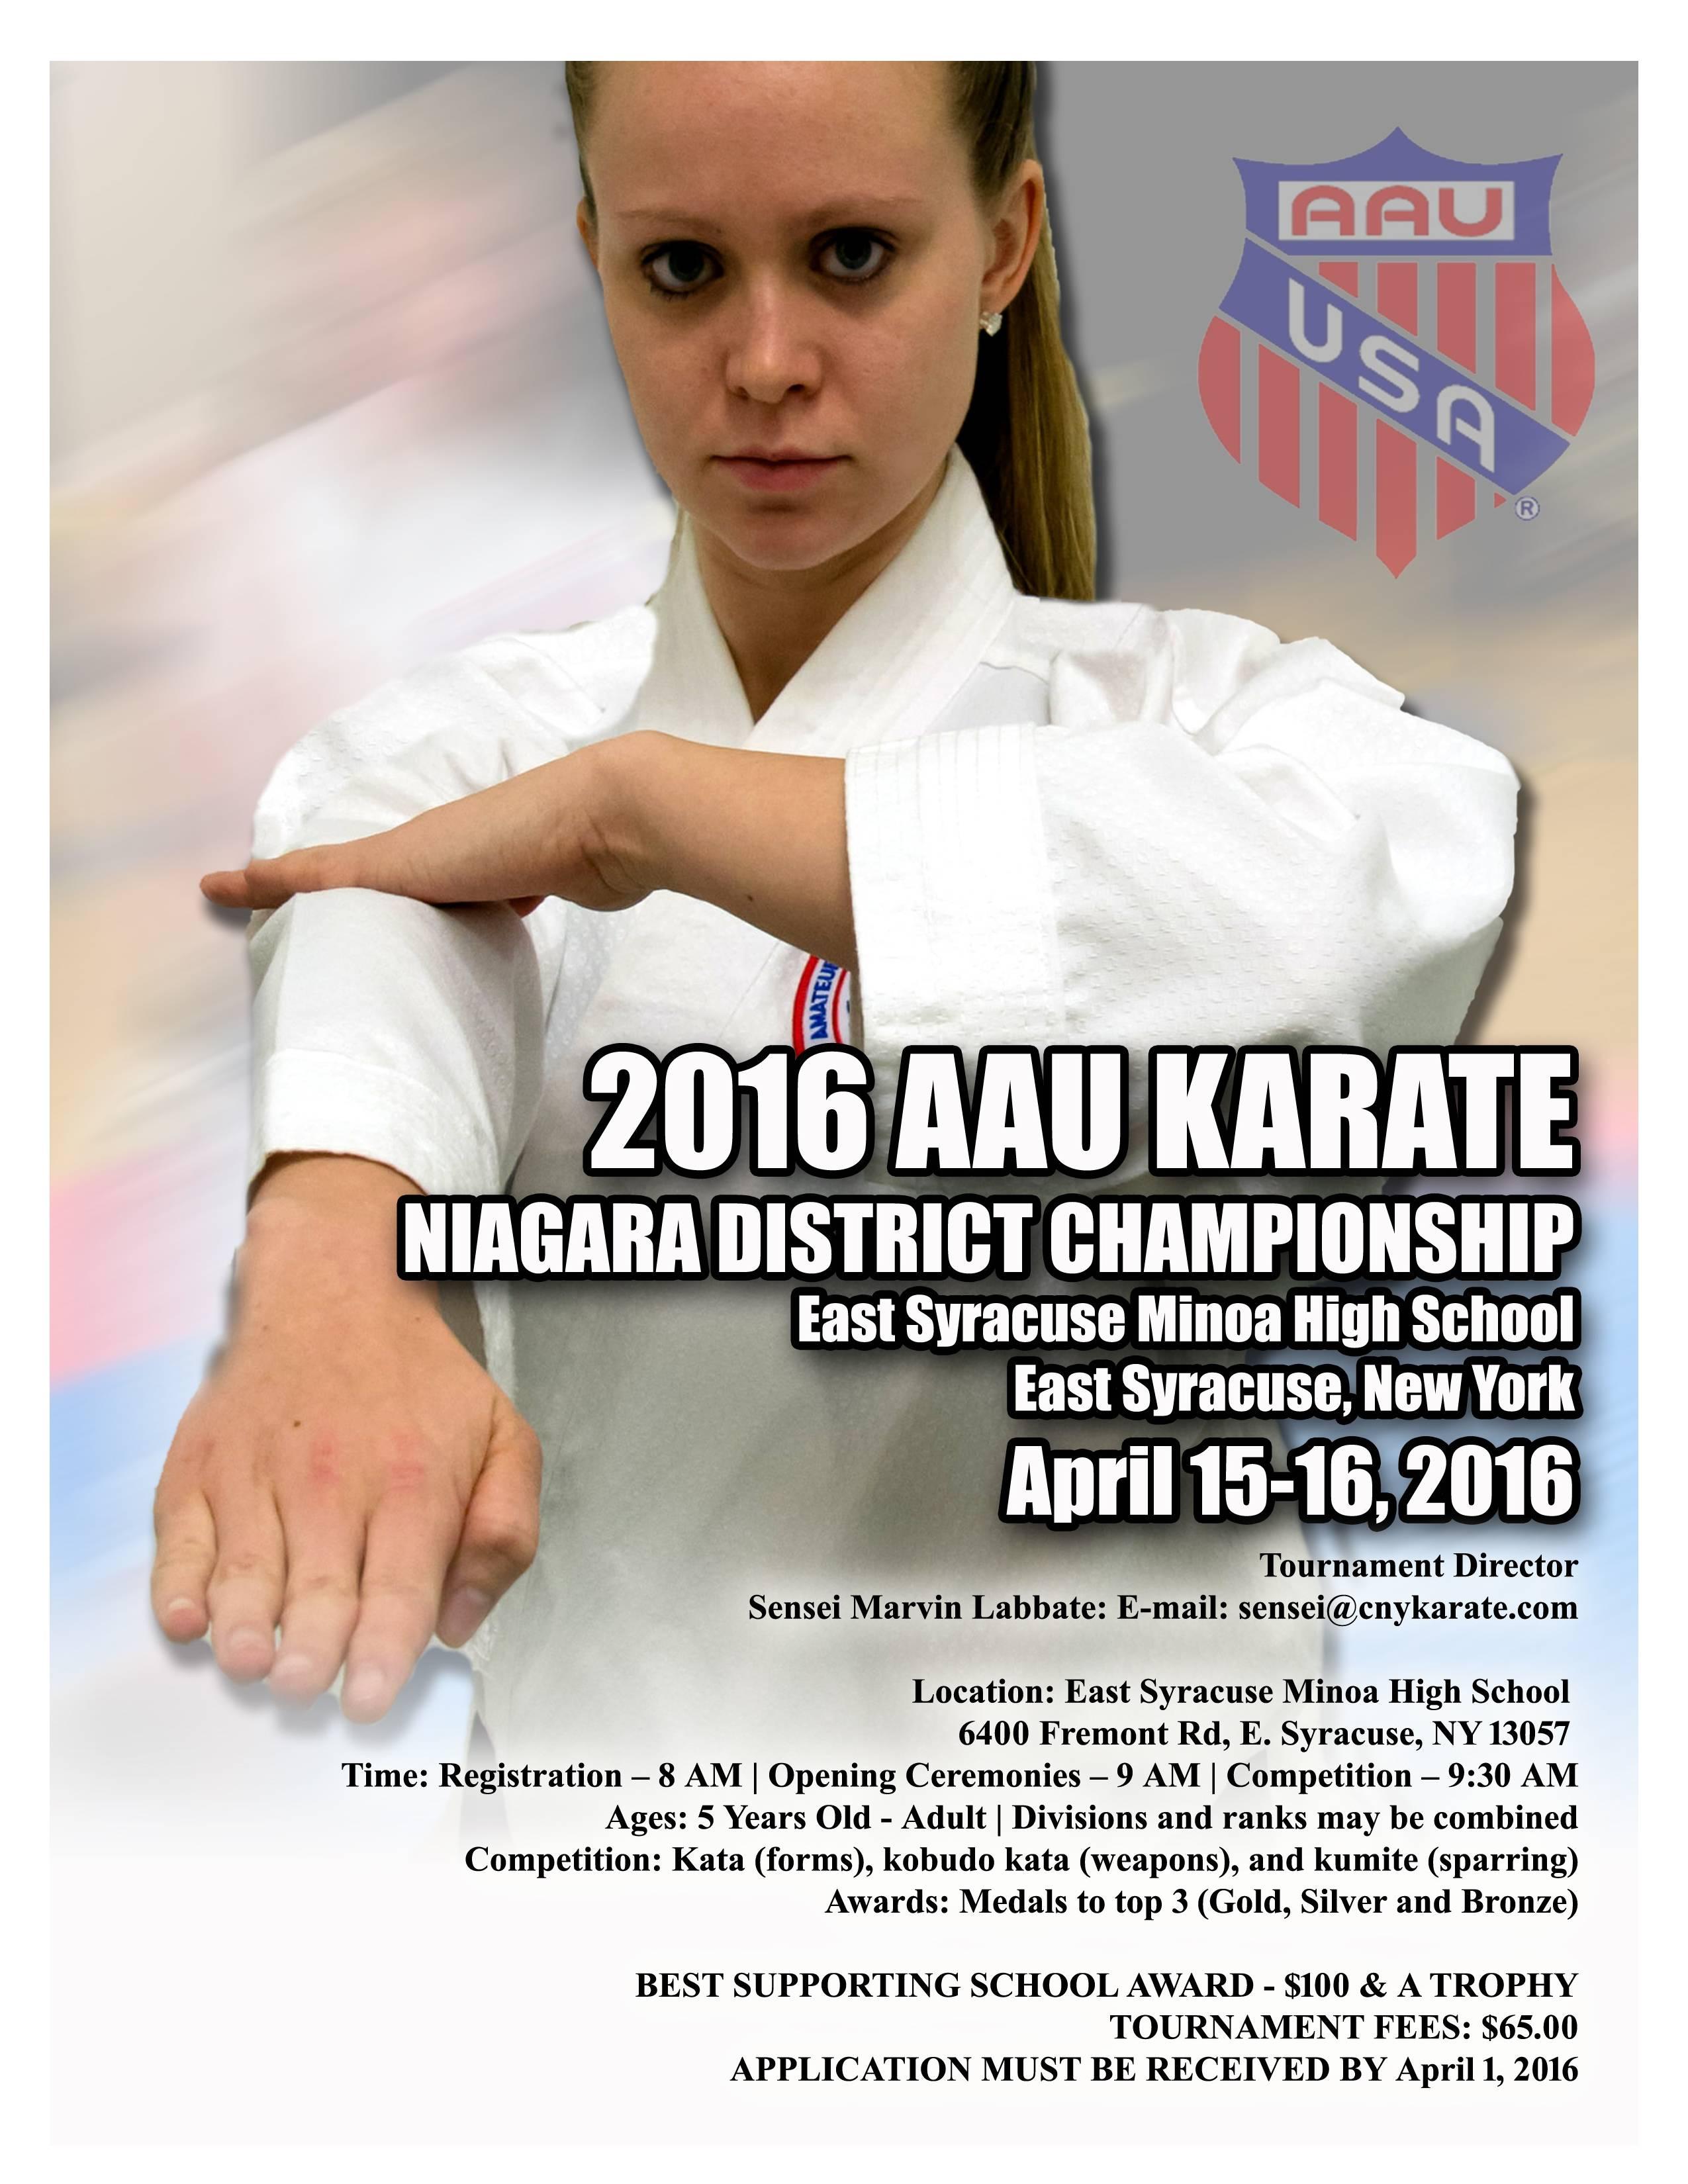 2016 AAU Karate Niagara District Championship